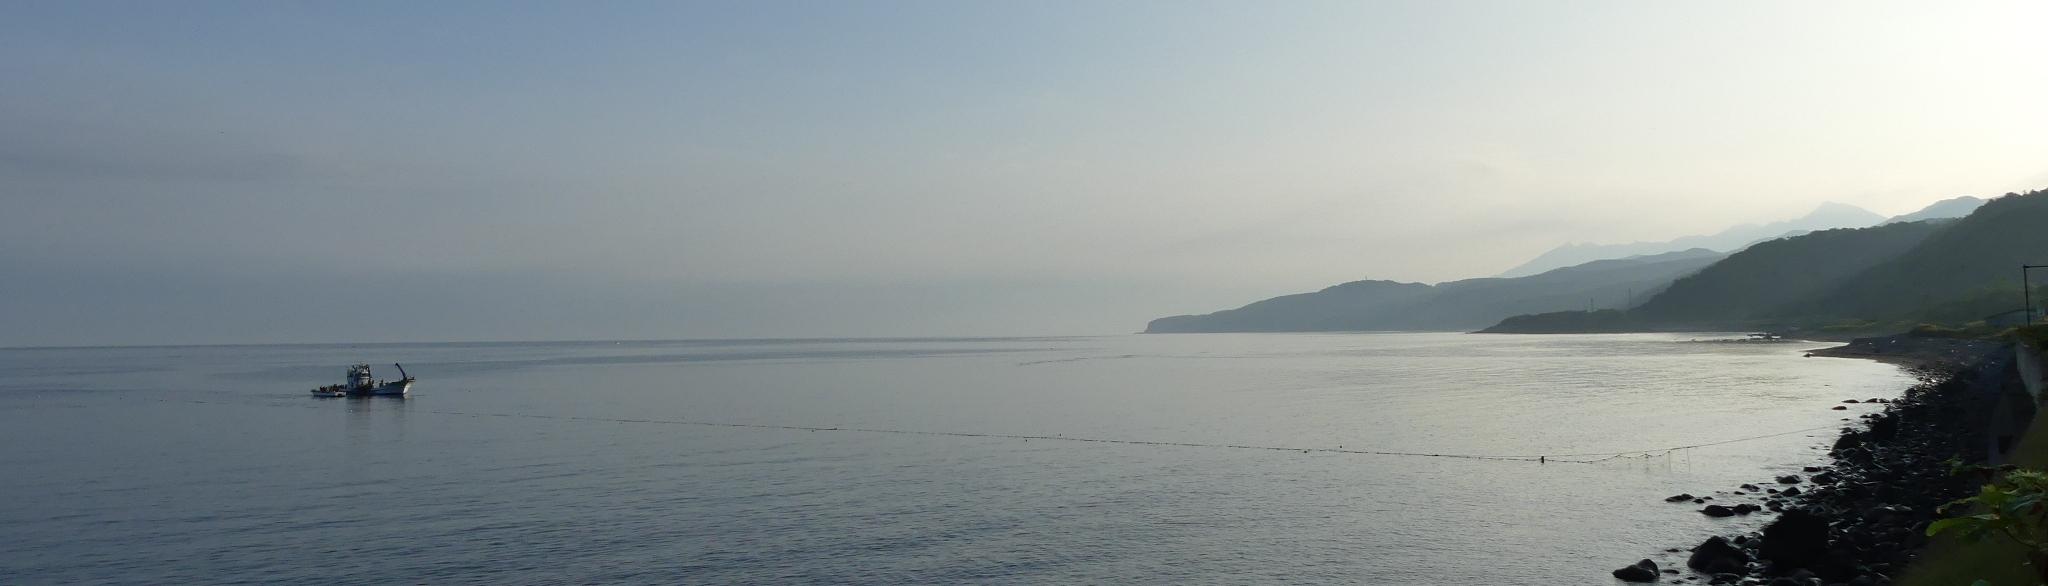 北海道帆立力_メイン画像